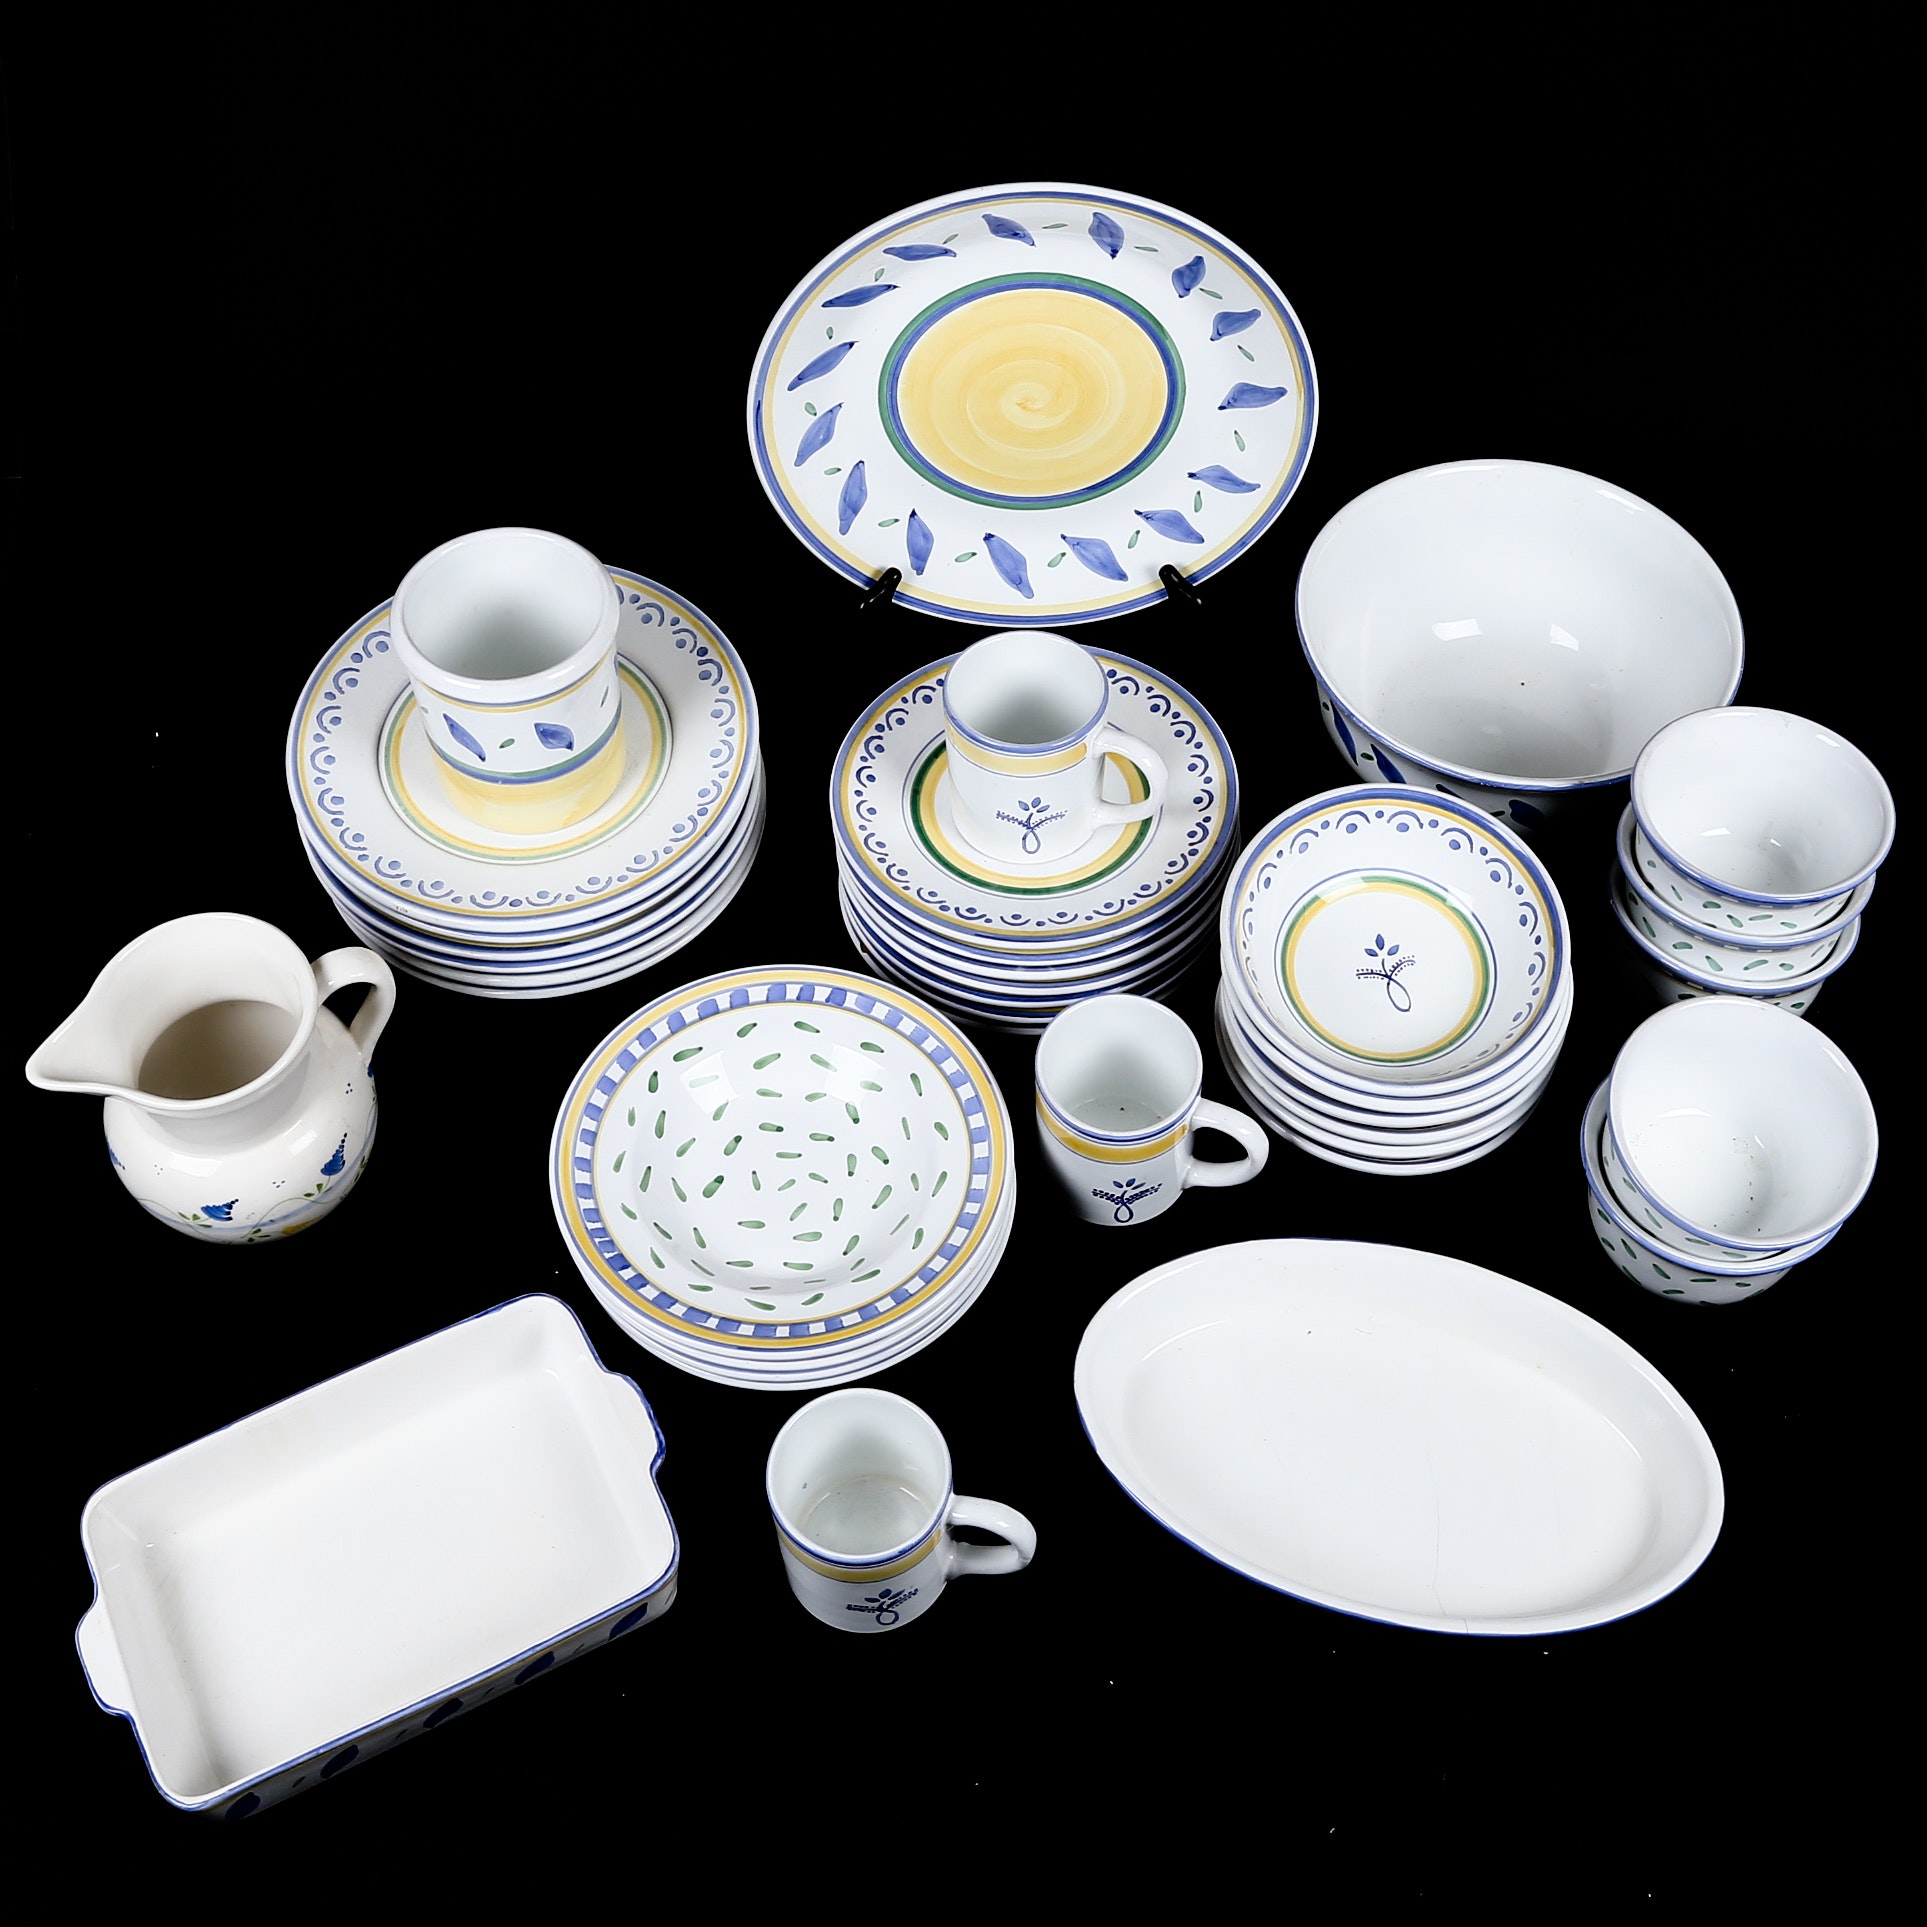 Williams-Sonoma Marisol Tournesol Tableware ...  sc 1 st  EBTH.com & Williams-Sonoma Marisol Tournesol Tableware : EBTH